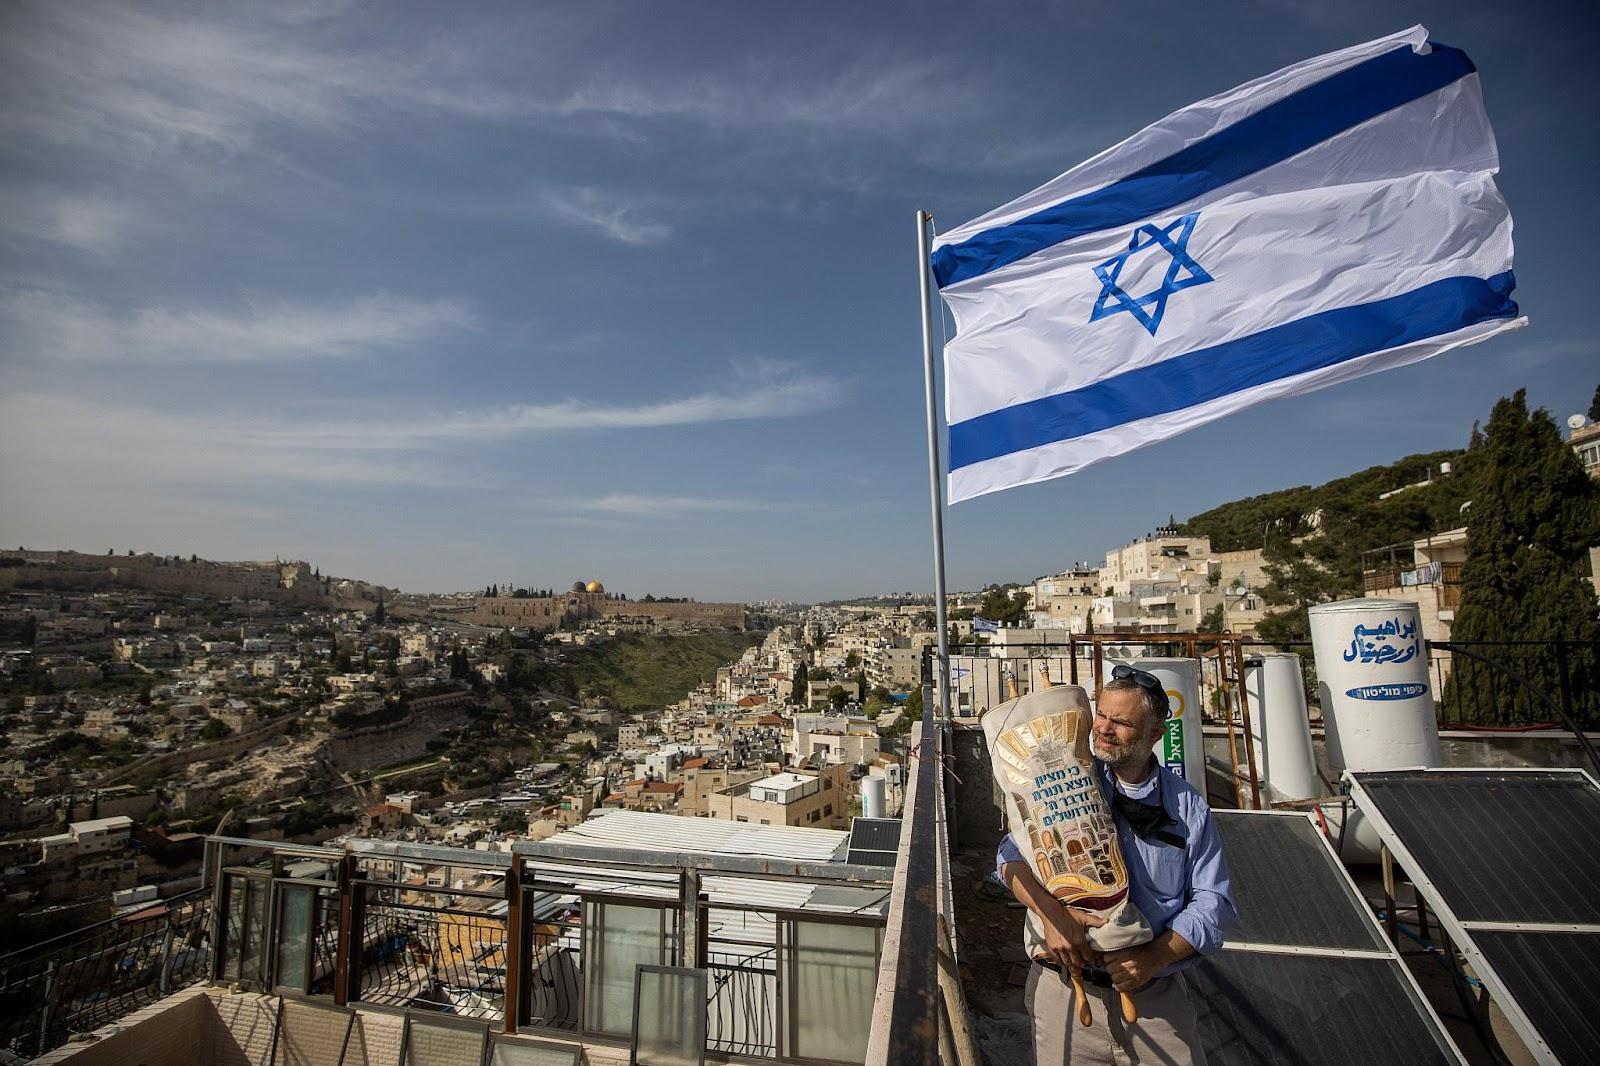 Macintosh HD SSD:Users:sophiemayoux:Desktop:Jewish man in Silwan.jpg